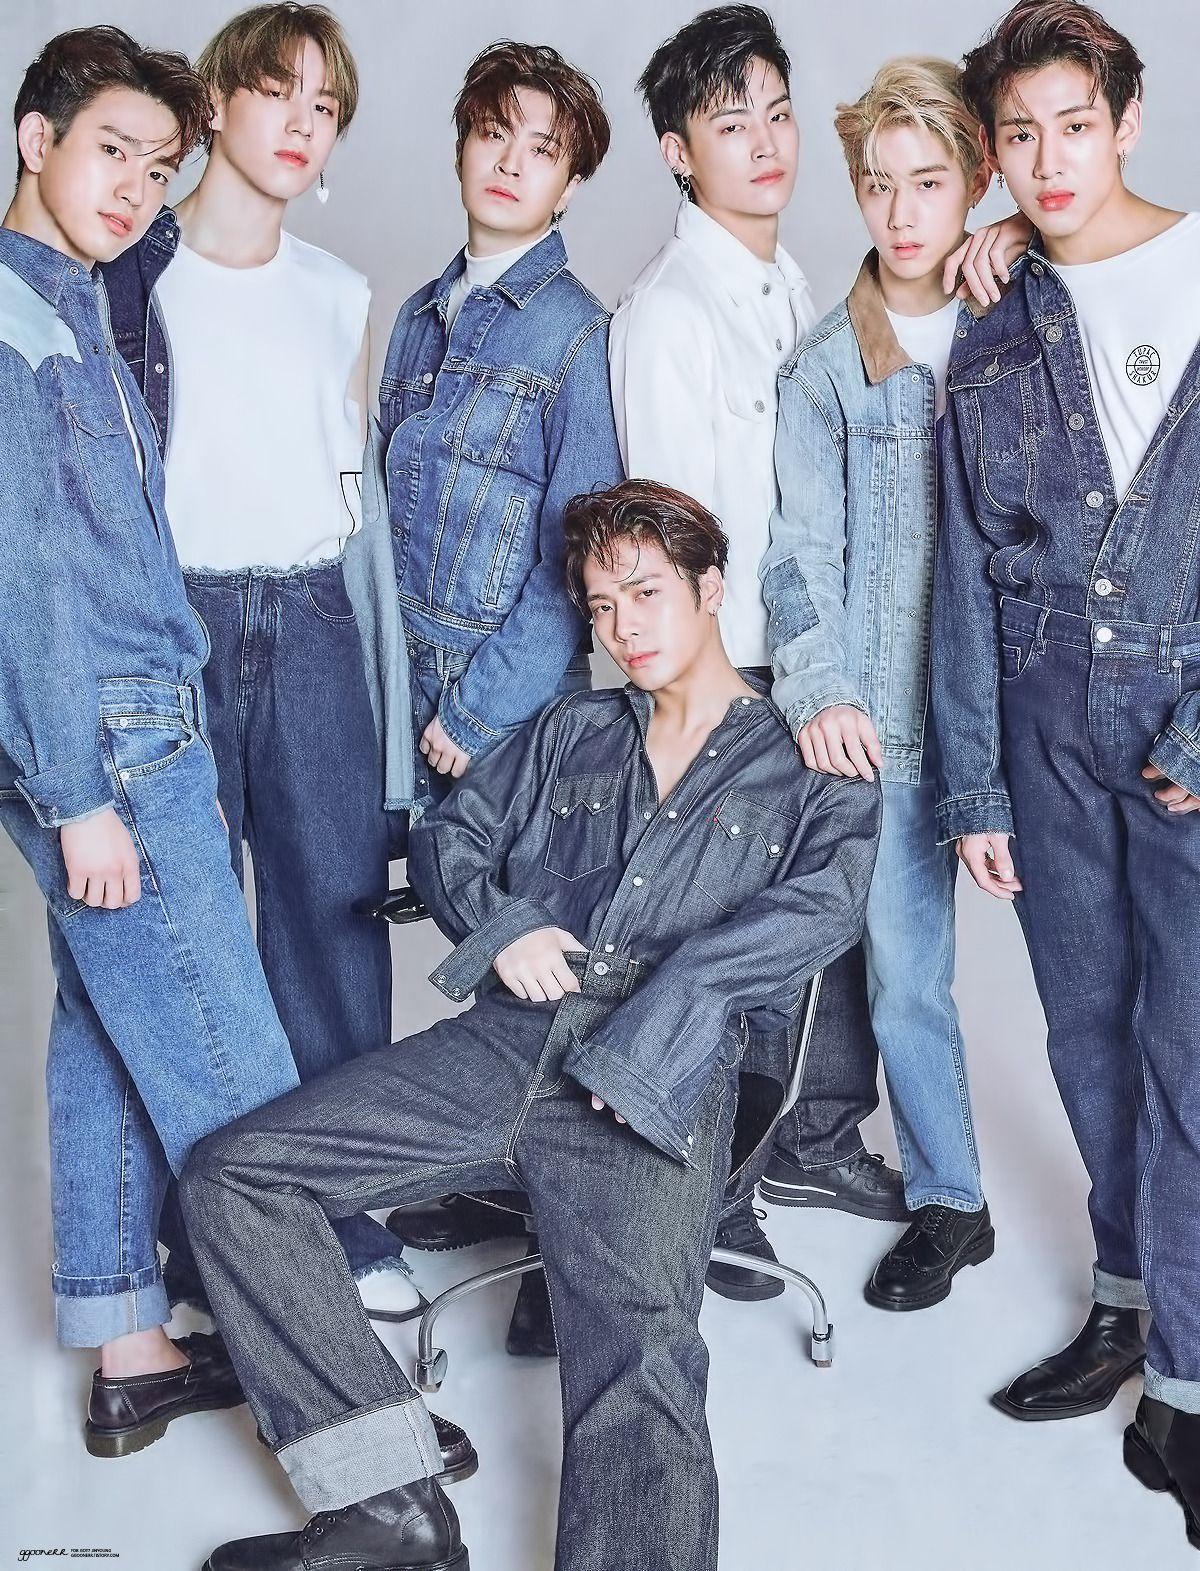 Jackson GOT7 | Got7 ในปี 2019 | จิน นักแสดง และ ศิลปิน |Jackson Got7 Ceci